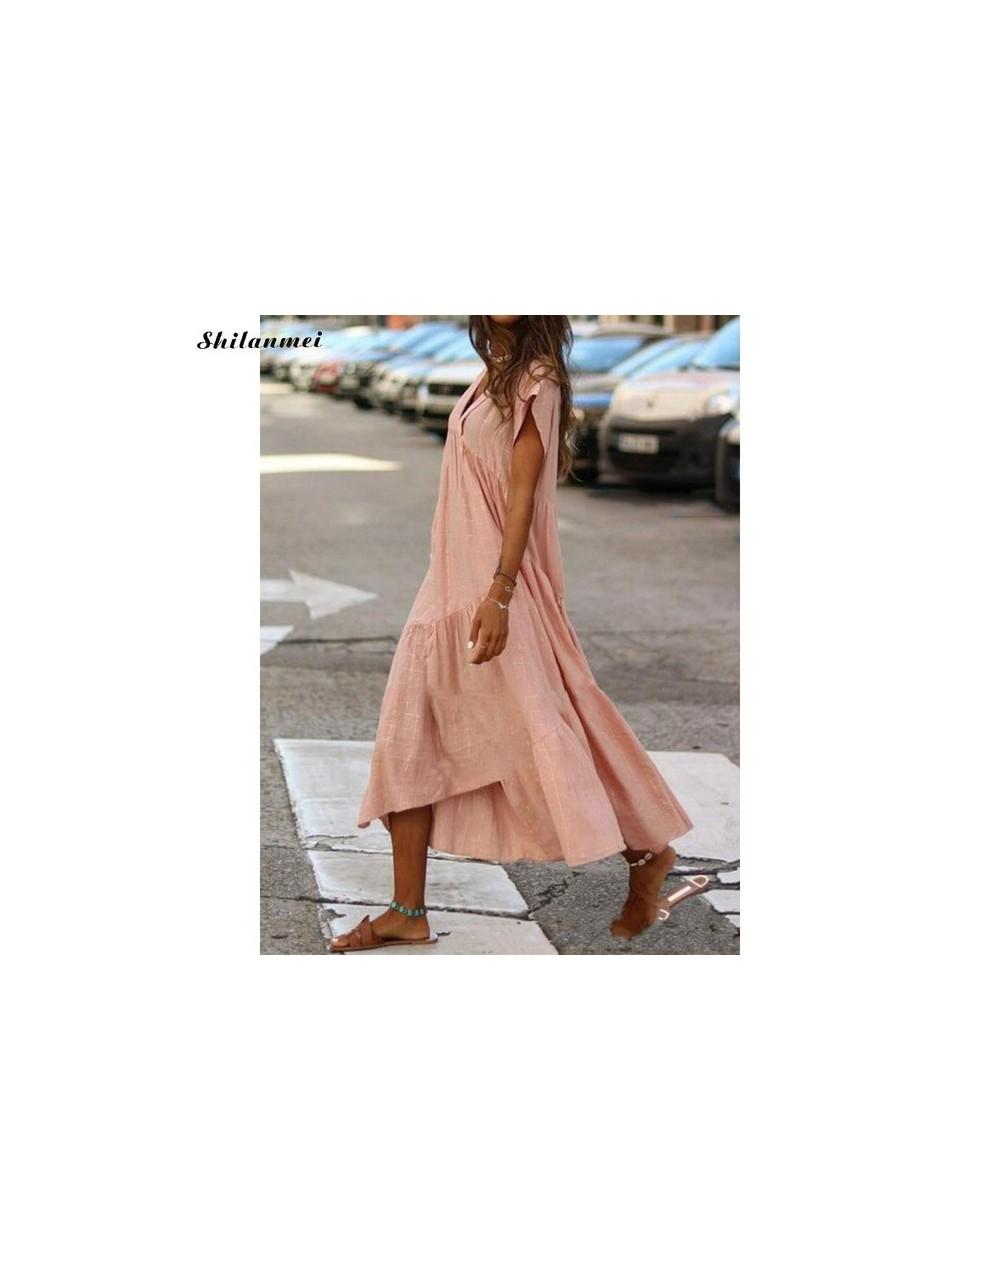 Summer Women V-Neck Pure Color Loose Dress Casual Short Sleeve Party Dresses Ladies Fashion Female Beach Long Dress Vestido ...